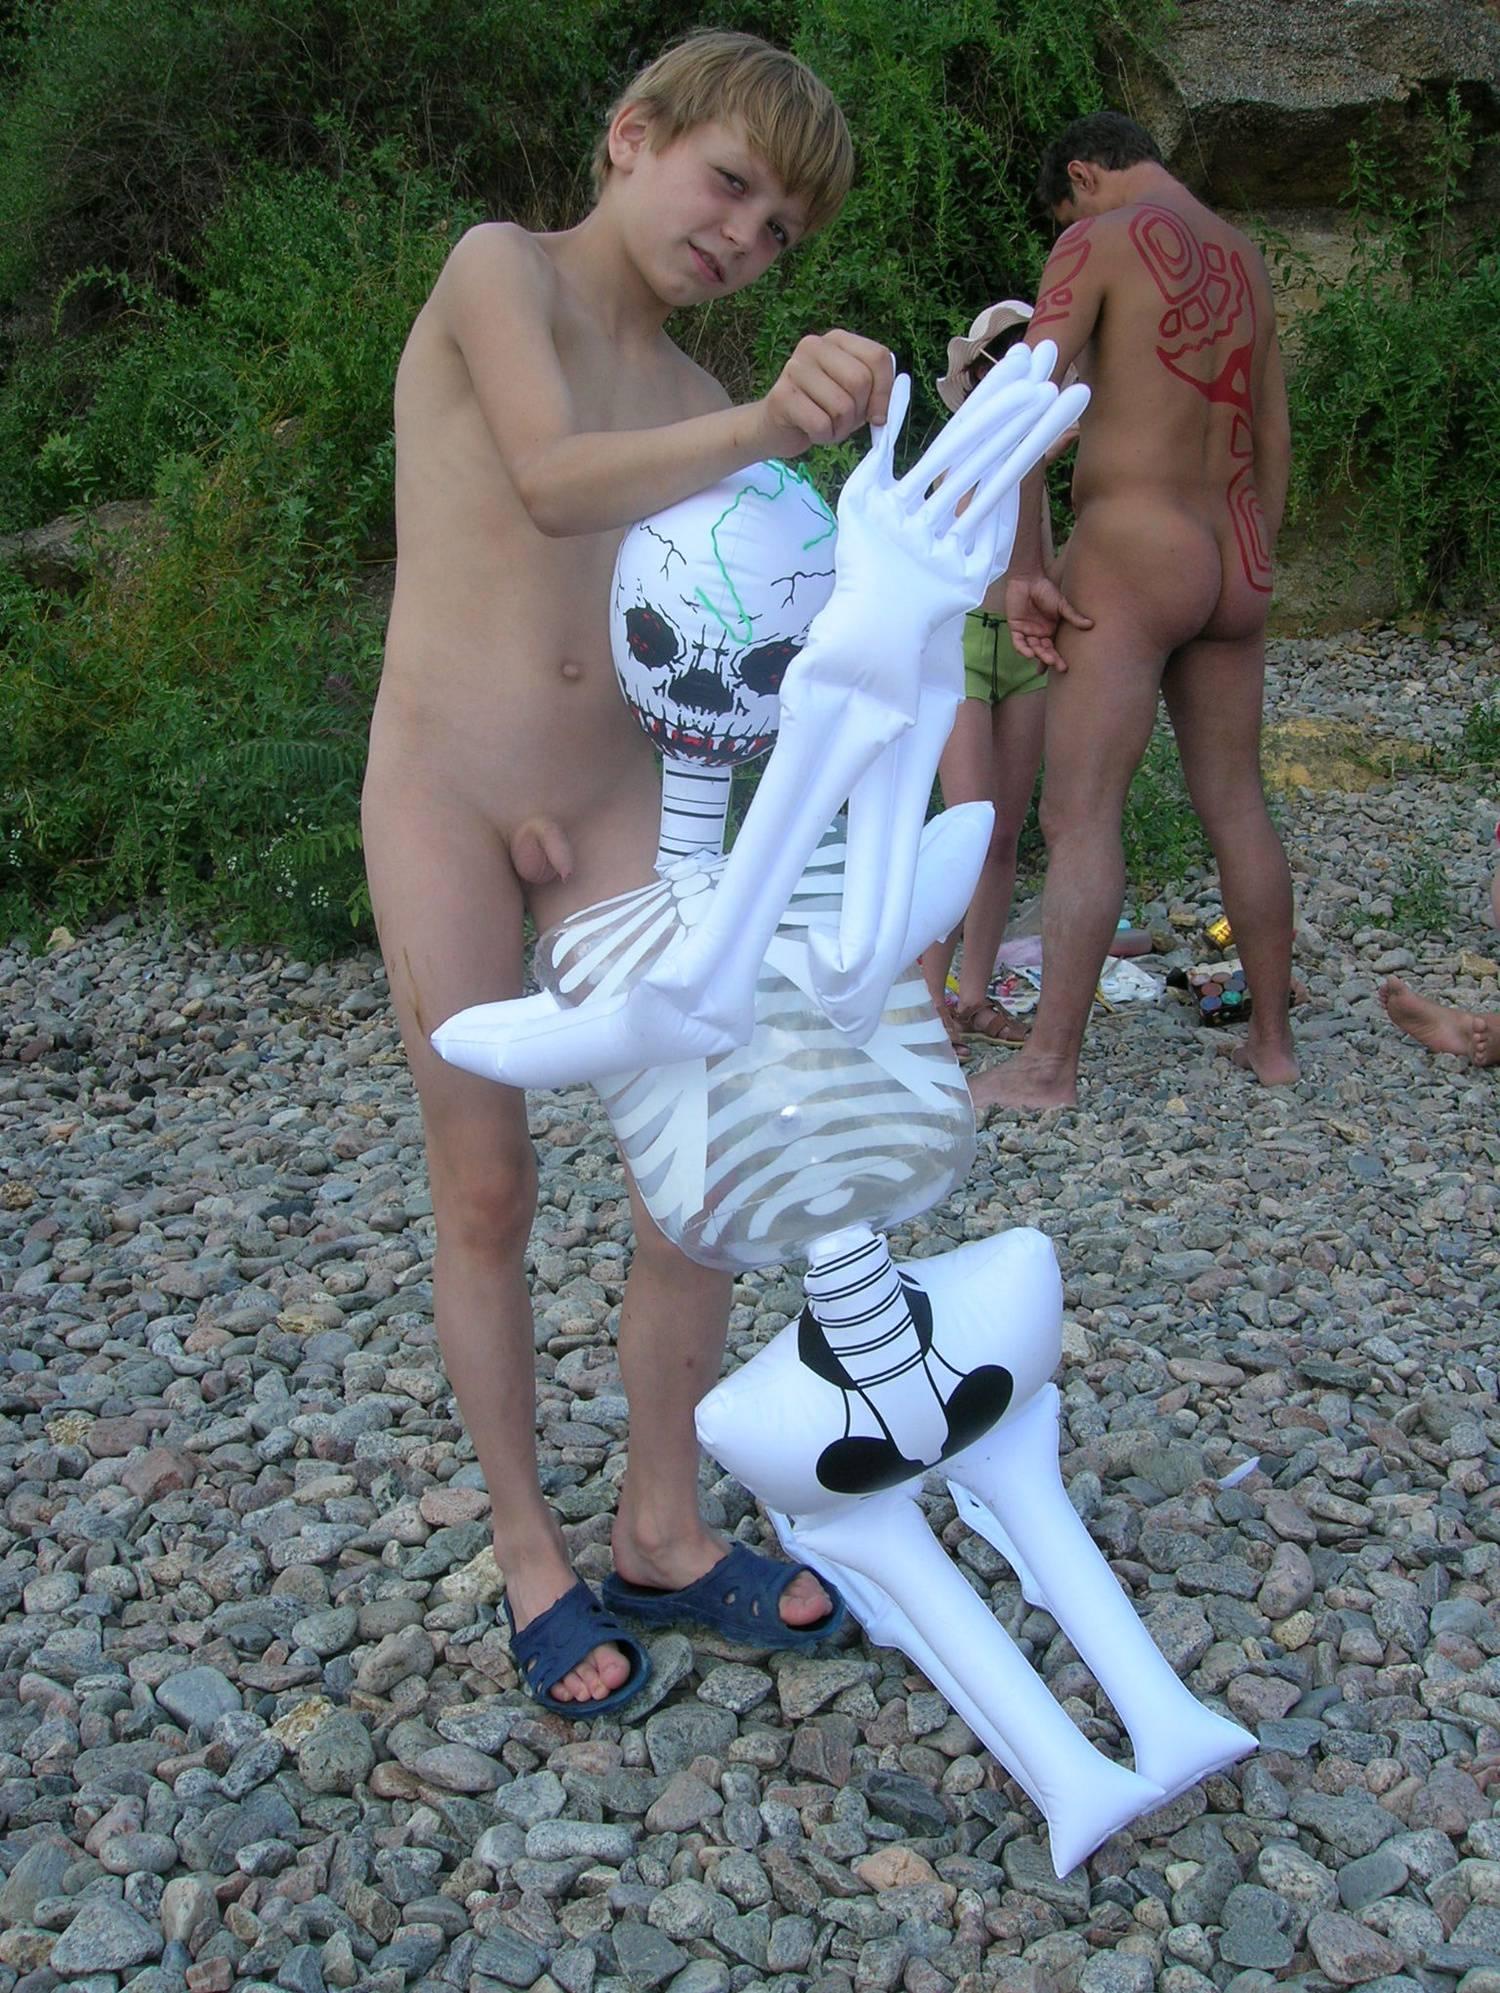 Purenudism Pics-The Naturist Ghost Dance - 2